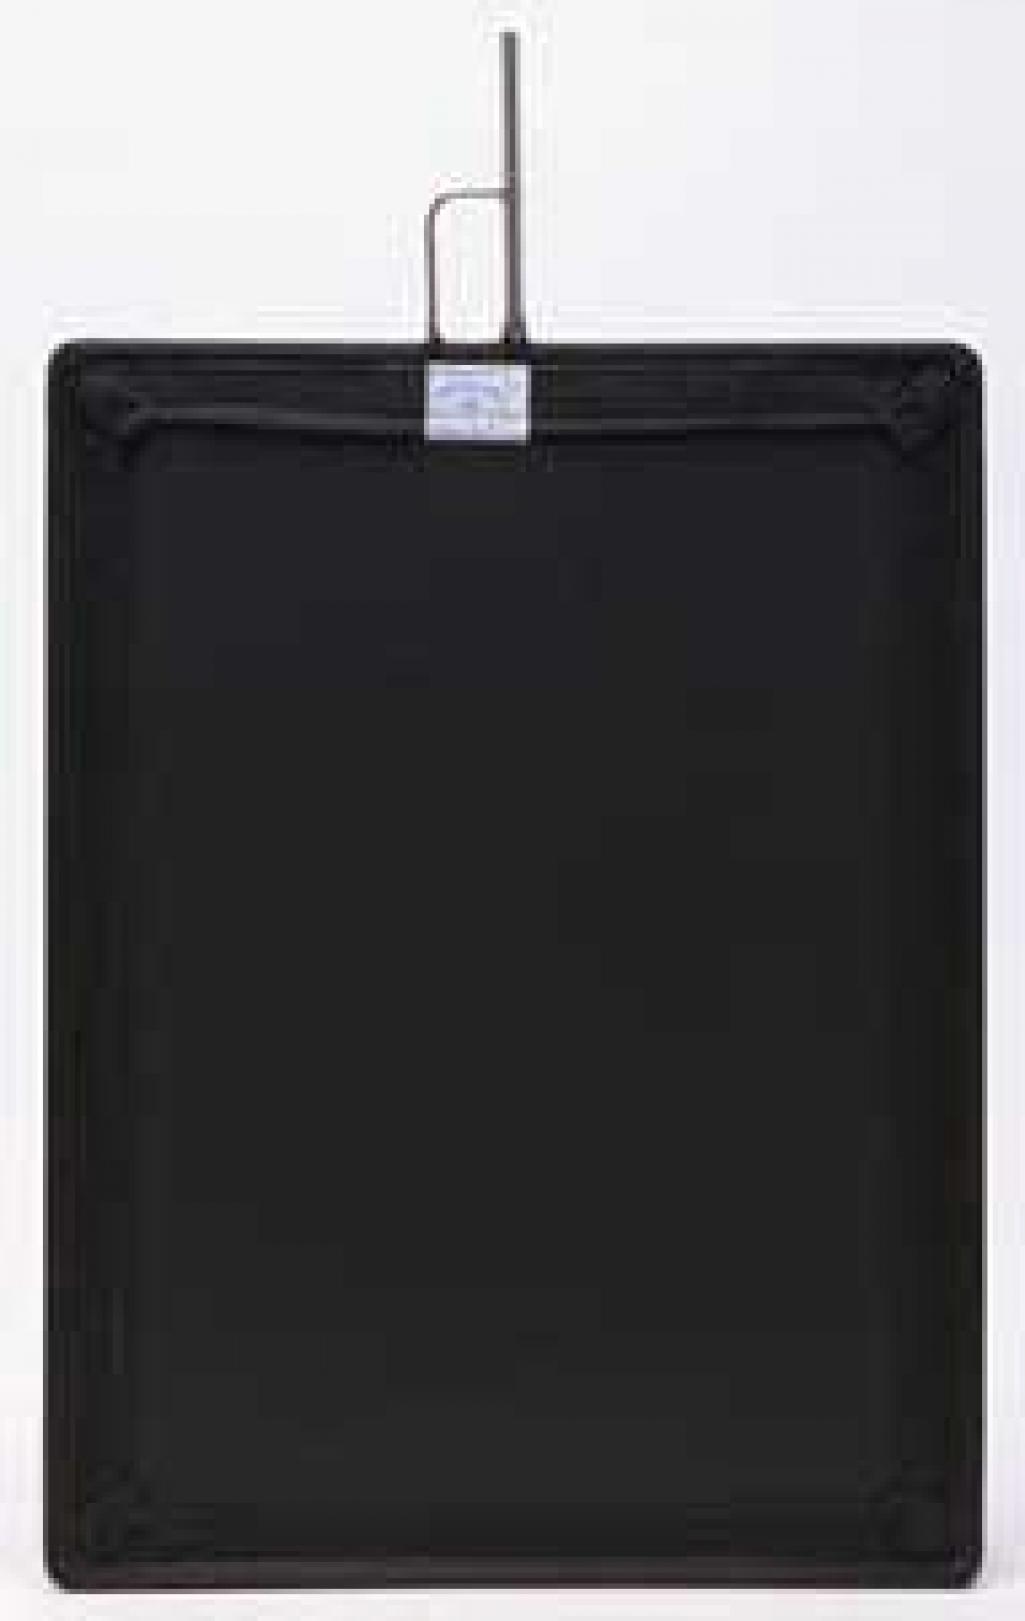 2x3 Solid Floppy